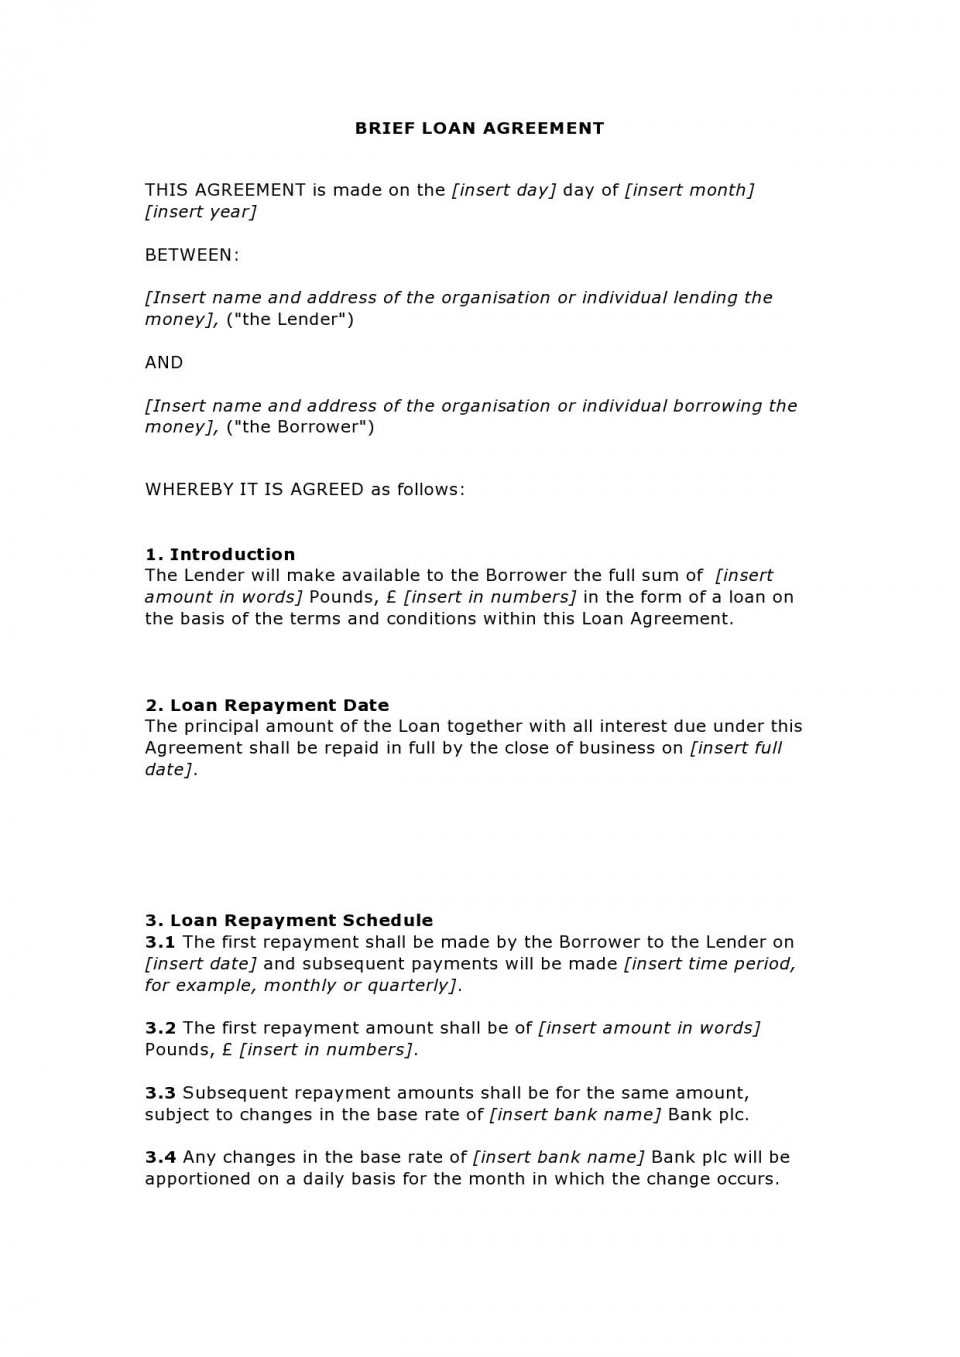 003 Unforgettable Family Loan Agreement Template Uk Free Idea 960